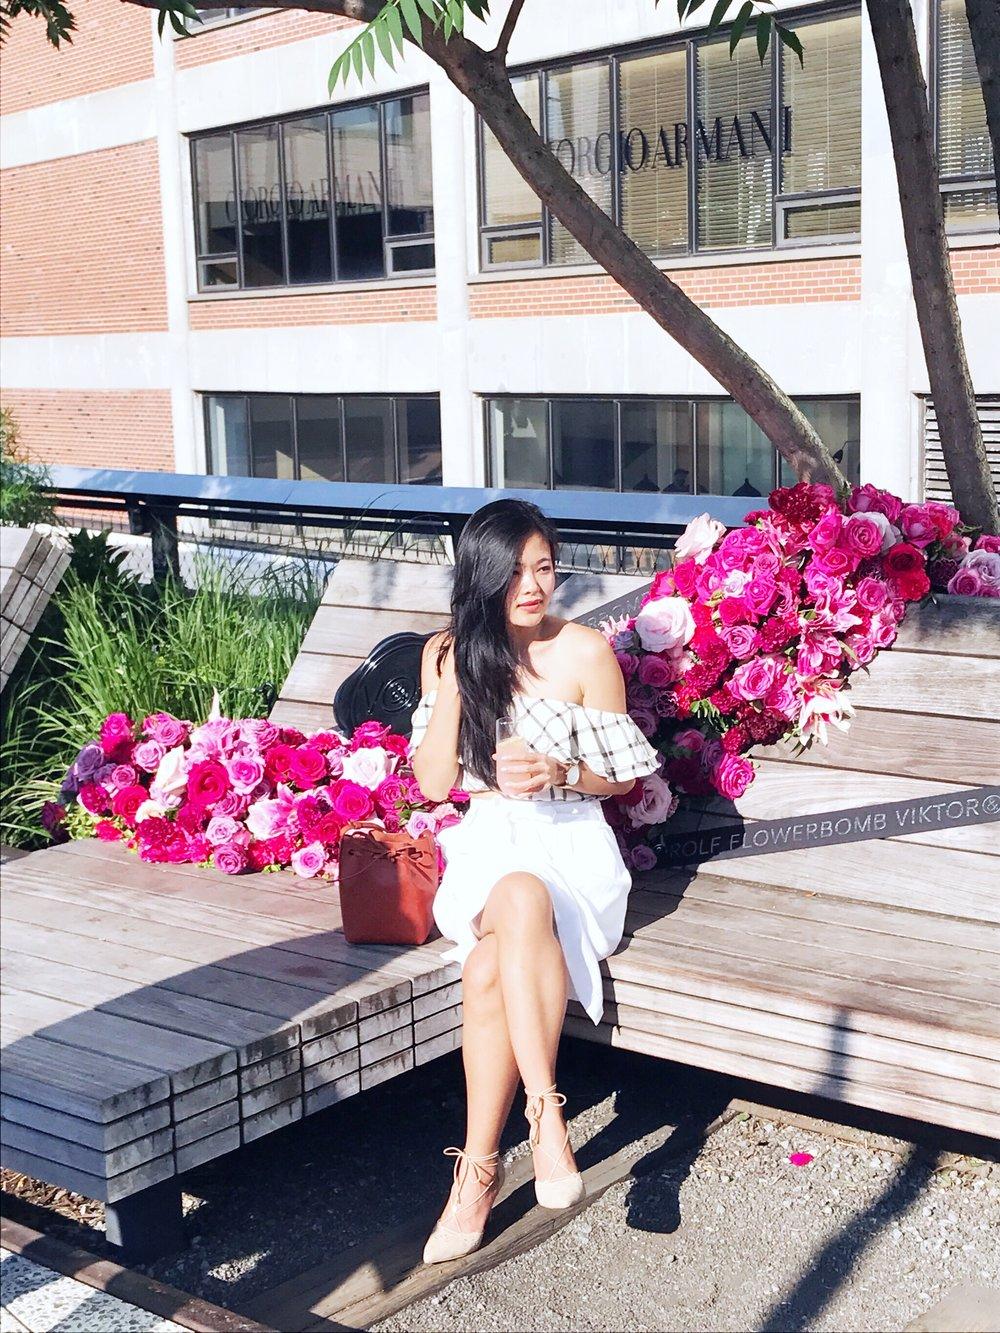 leanne wei honeyandvelvet flowerbomb twist viktor & rolf